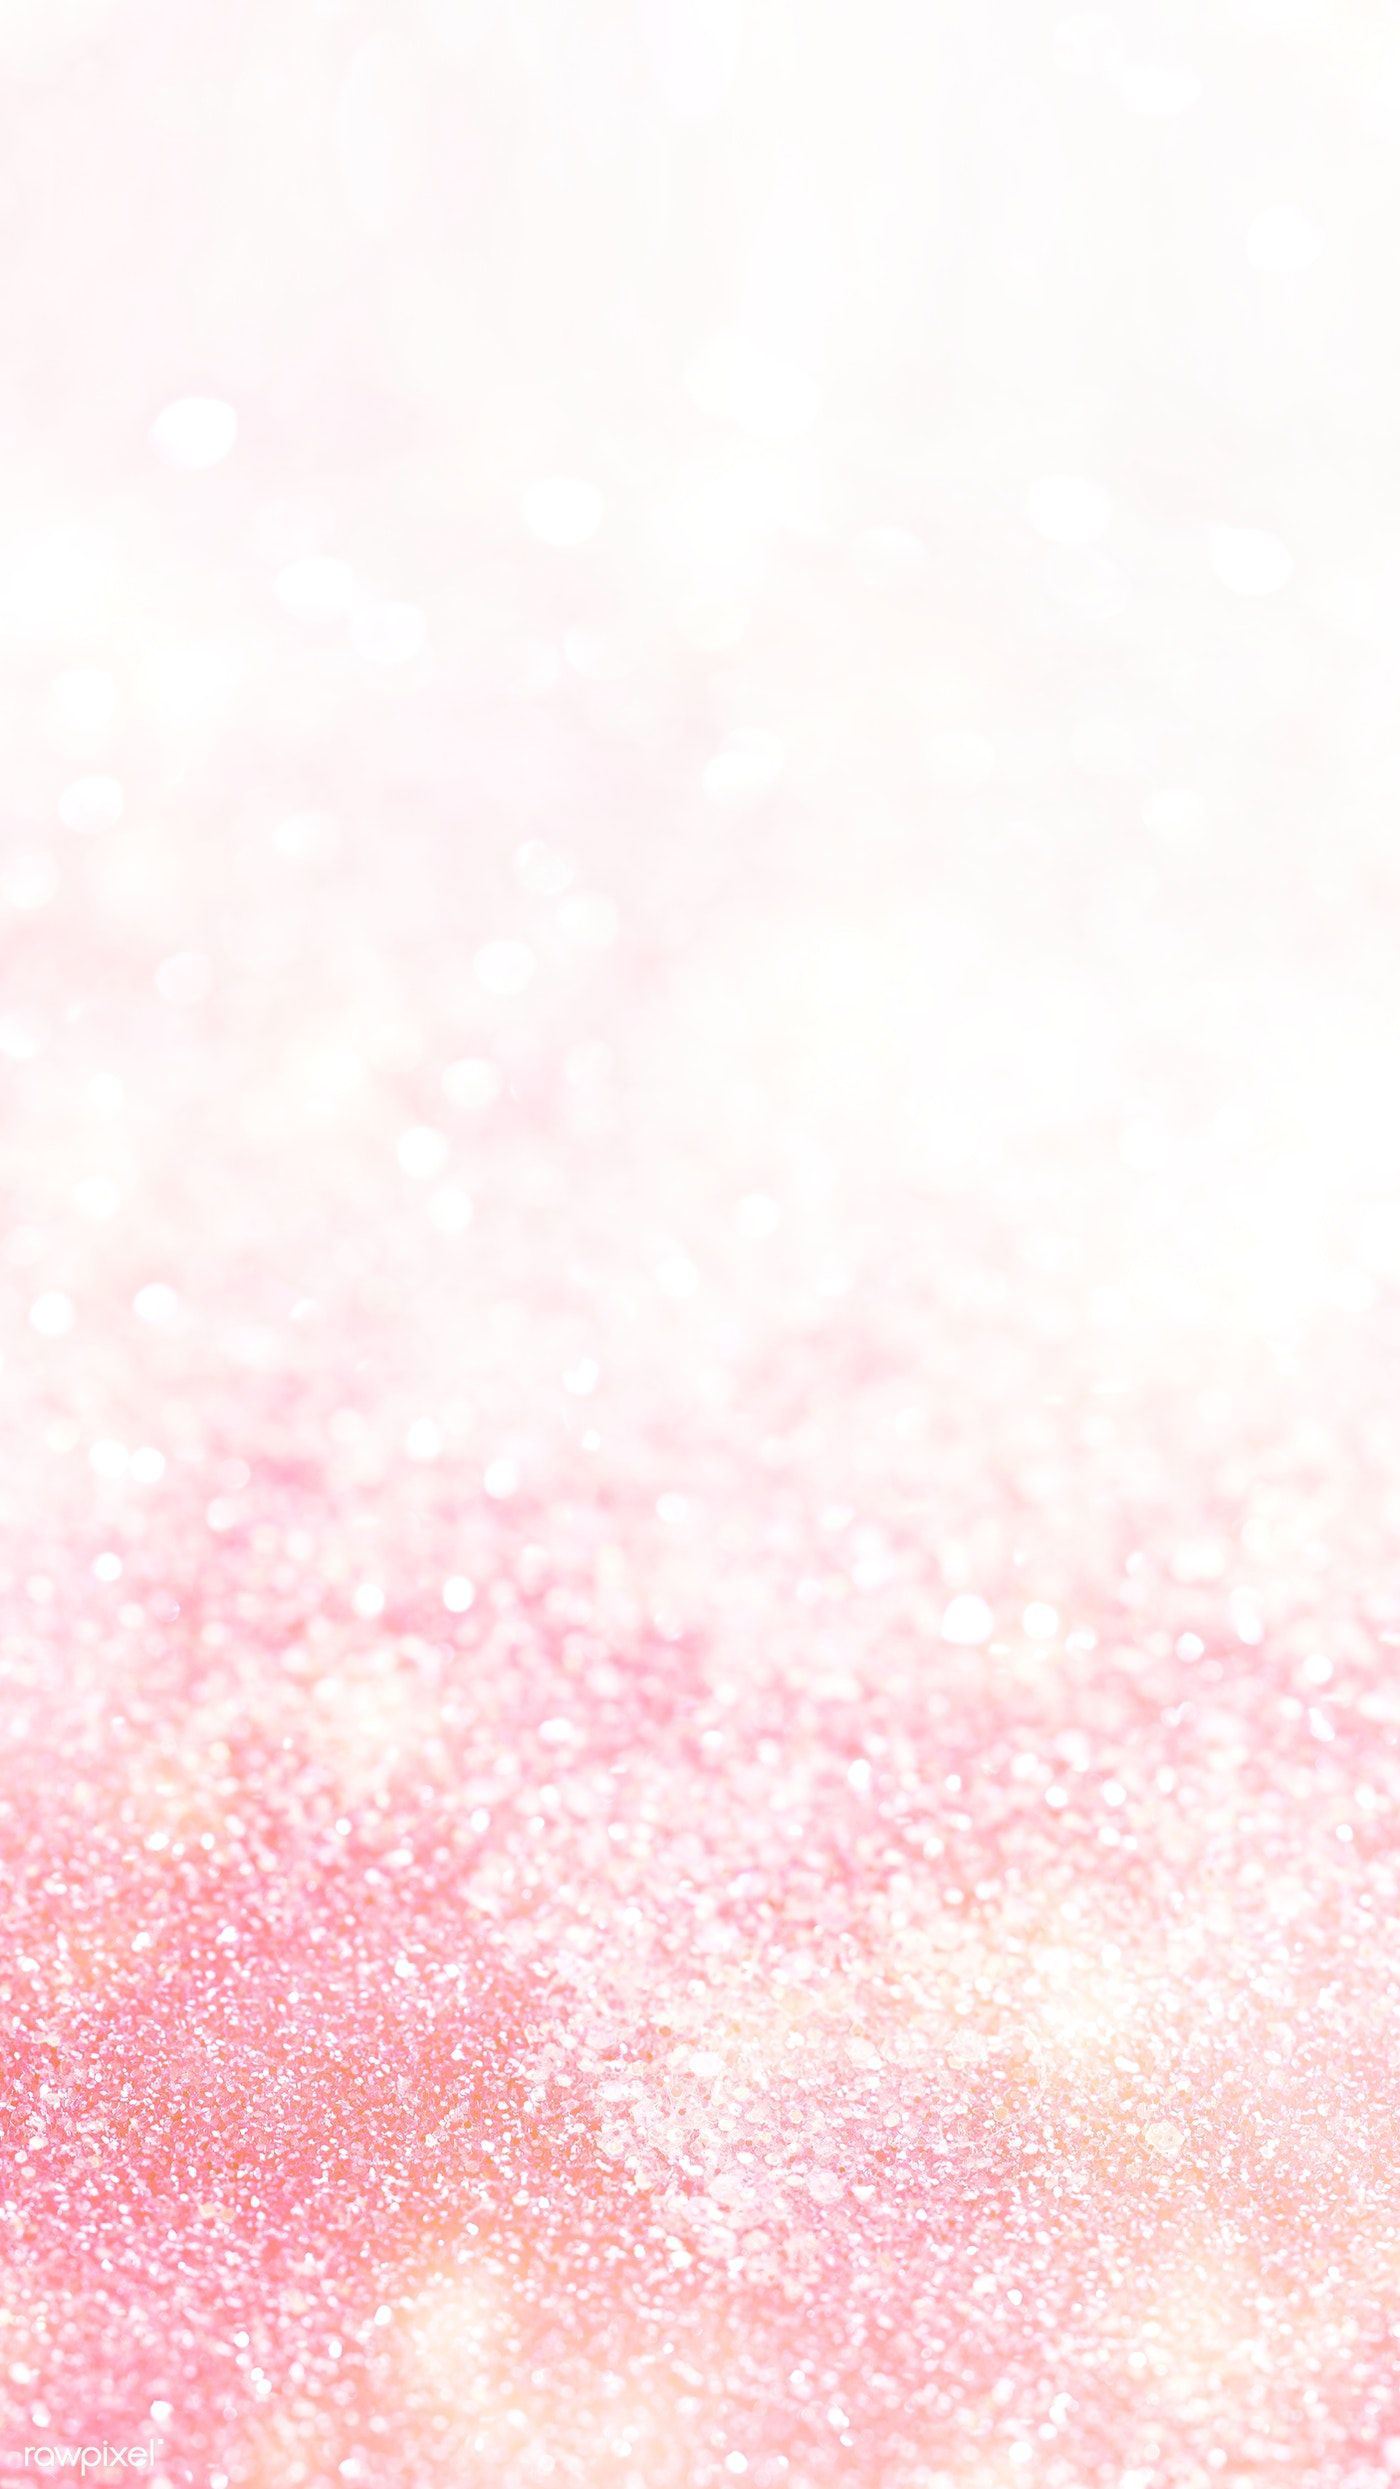 Download Premium Image Of Light Pink Glitter Gradient Background Mobile Pink Sparkle Background Pink Glitter Background Pink Background Iphone soft pink pink glitter wallpaper